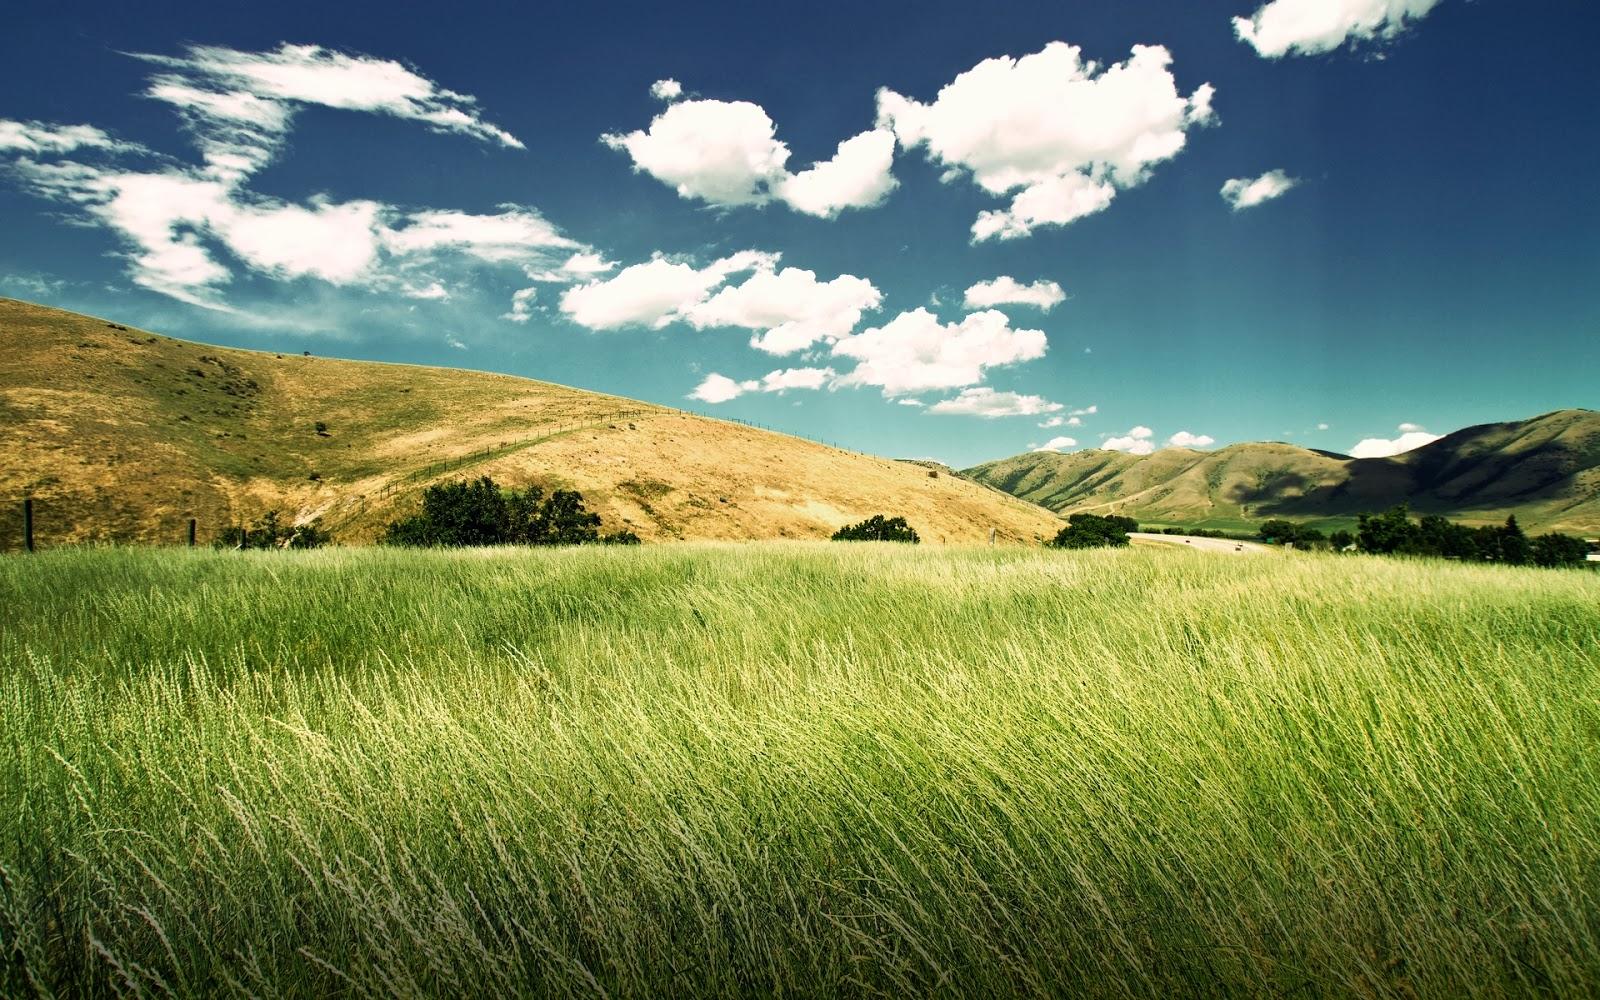 "<img src=""http://1.bp.blogspot.com/-w9AuX79axko/UuqwVOhtsnI/AAAAAAAAKuI/CY4xVIfboE0/s1600/natural-grass-wallpaper.jpg"" alt=""natural grass wallpaper"" />"